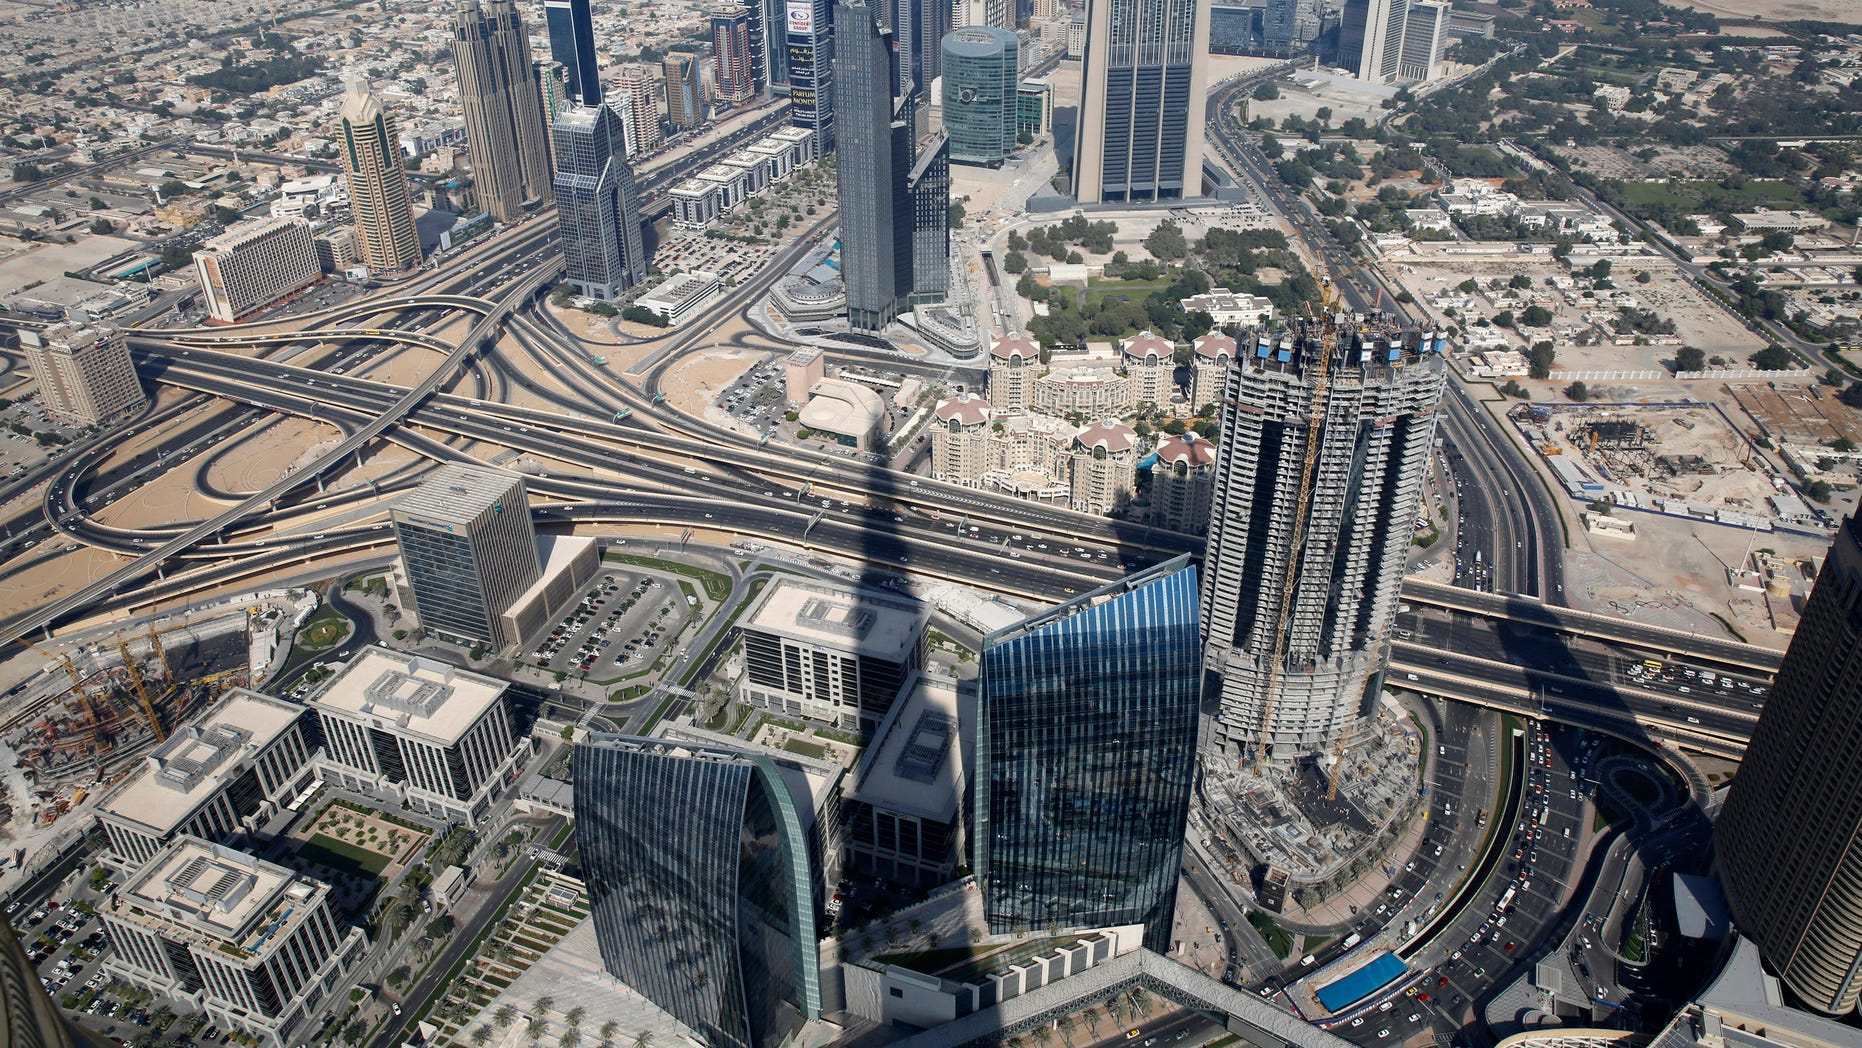 An aerial view of Dubai from Burj Khalifa, the tallest building in the world, in Dubai.